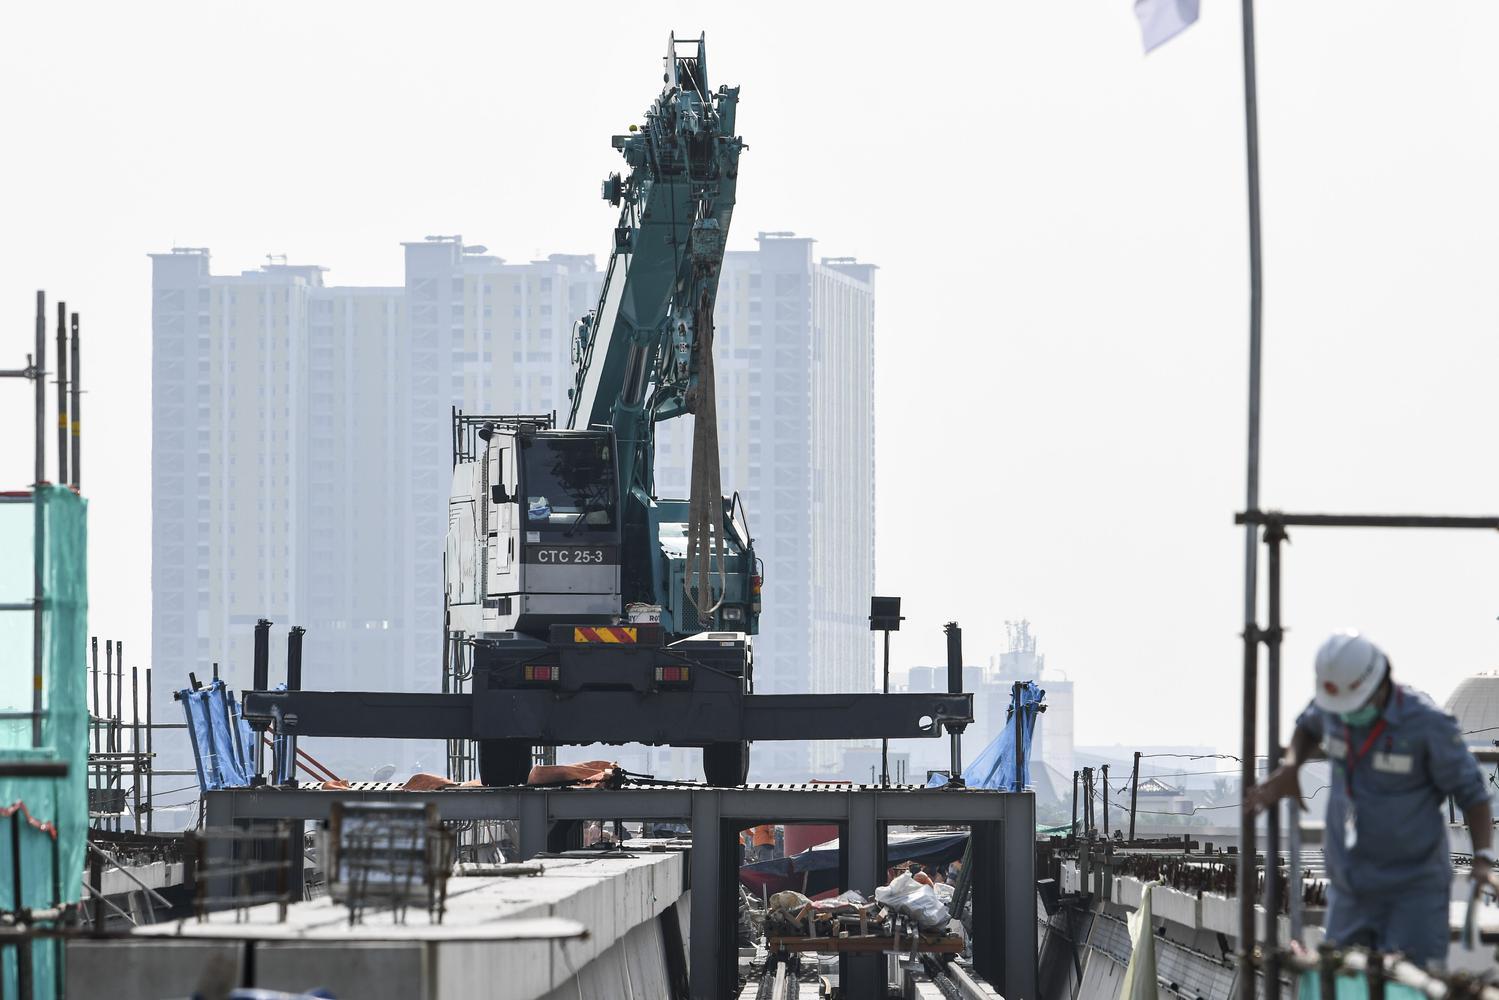 Sebuah alat berat berada di proyek pembangunan 'longspan' atau jembatan bentang panjang lintasan 'Light Rail Transit (LRT)' di kawasan Dukuh Atas, Jakarta, Rabu (11/11/2020). PT Adhi Karya (Persero) Tbk telah menyelesaikan pembangunan longspan terakhir sepanjang 218 meter yang menghubungkan lintasan LRT dari Cawang-Kuningan-Dukuh Atas.